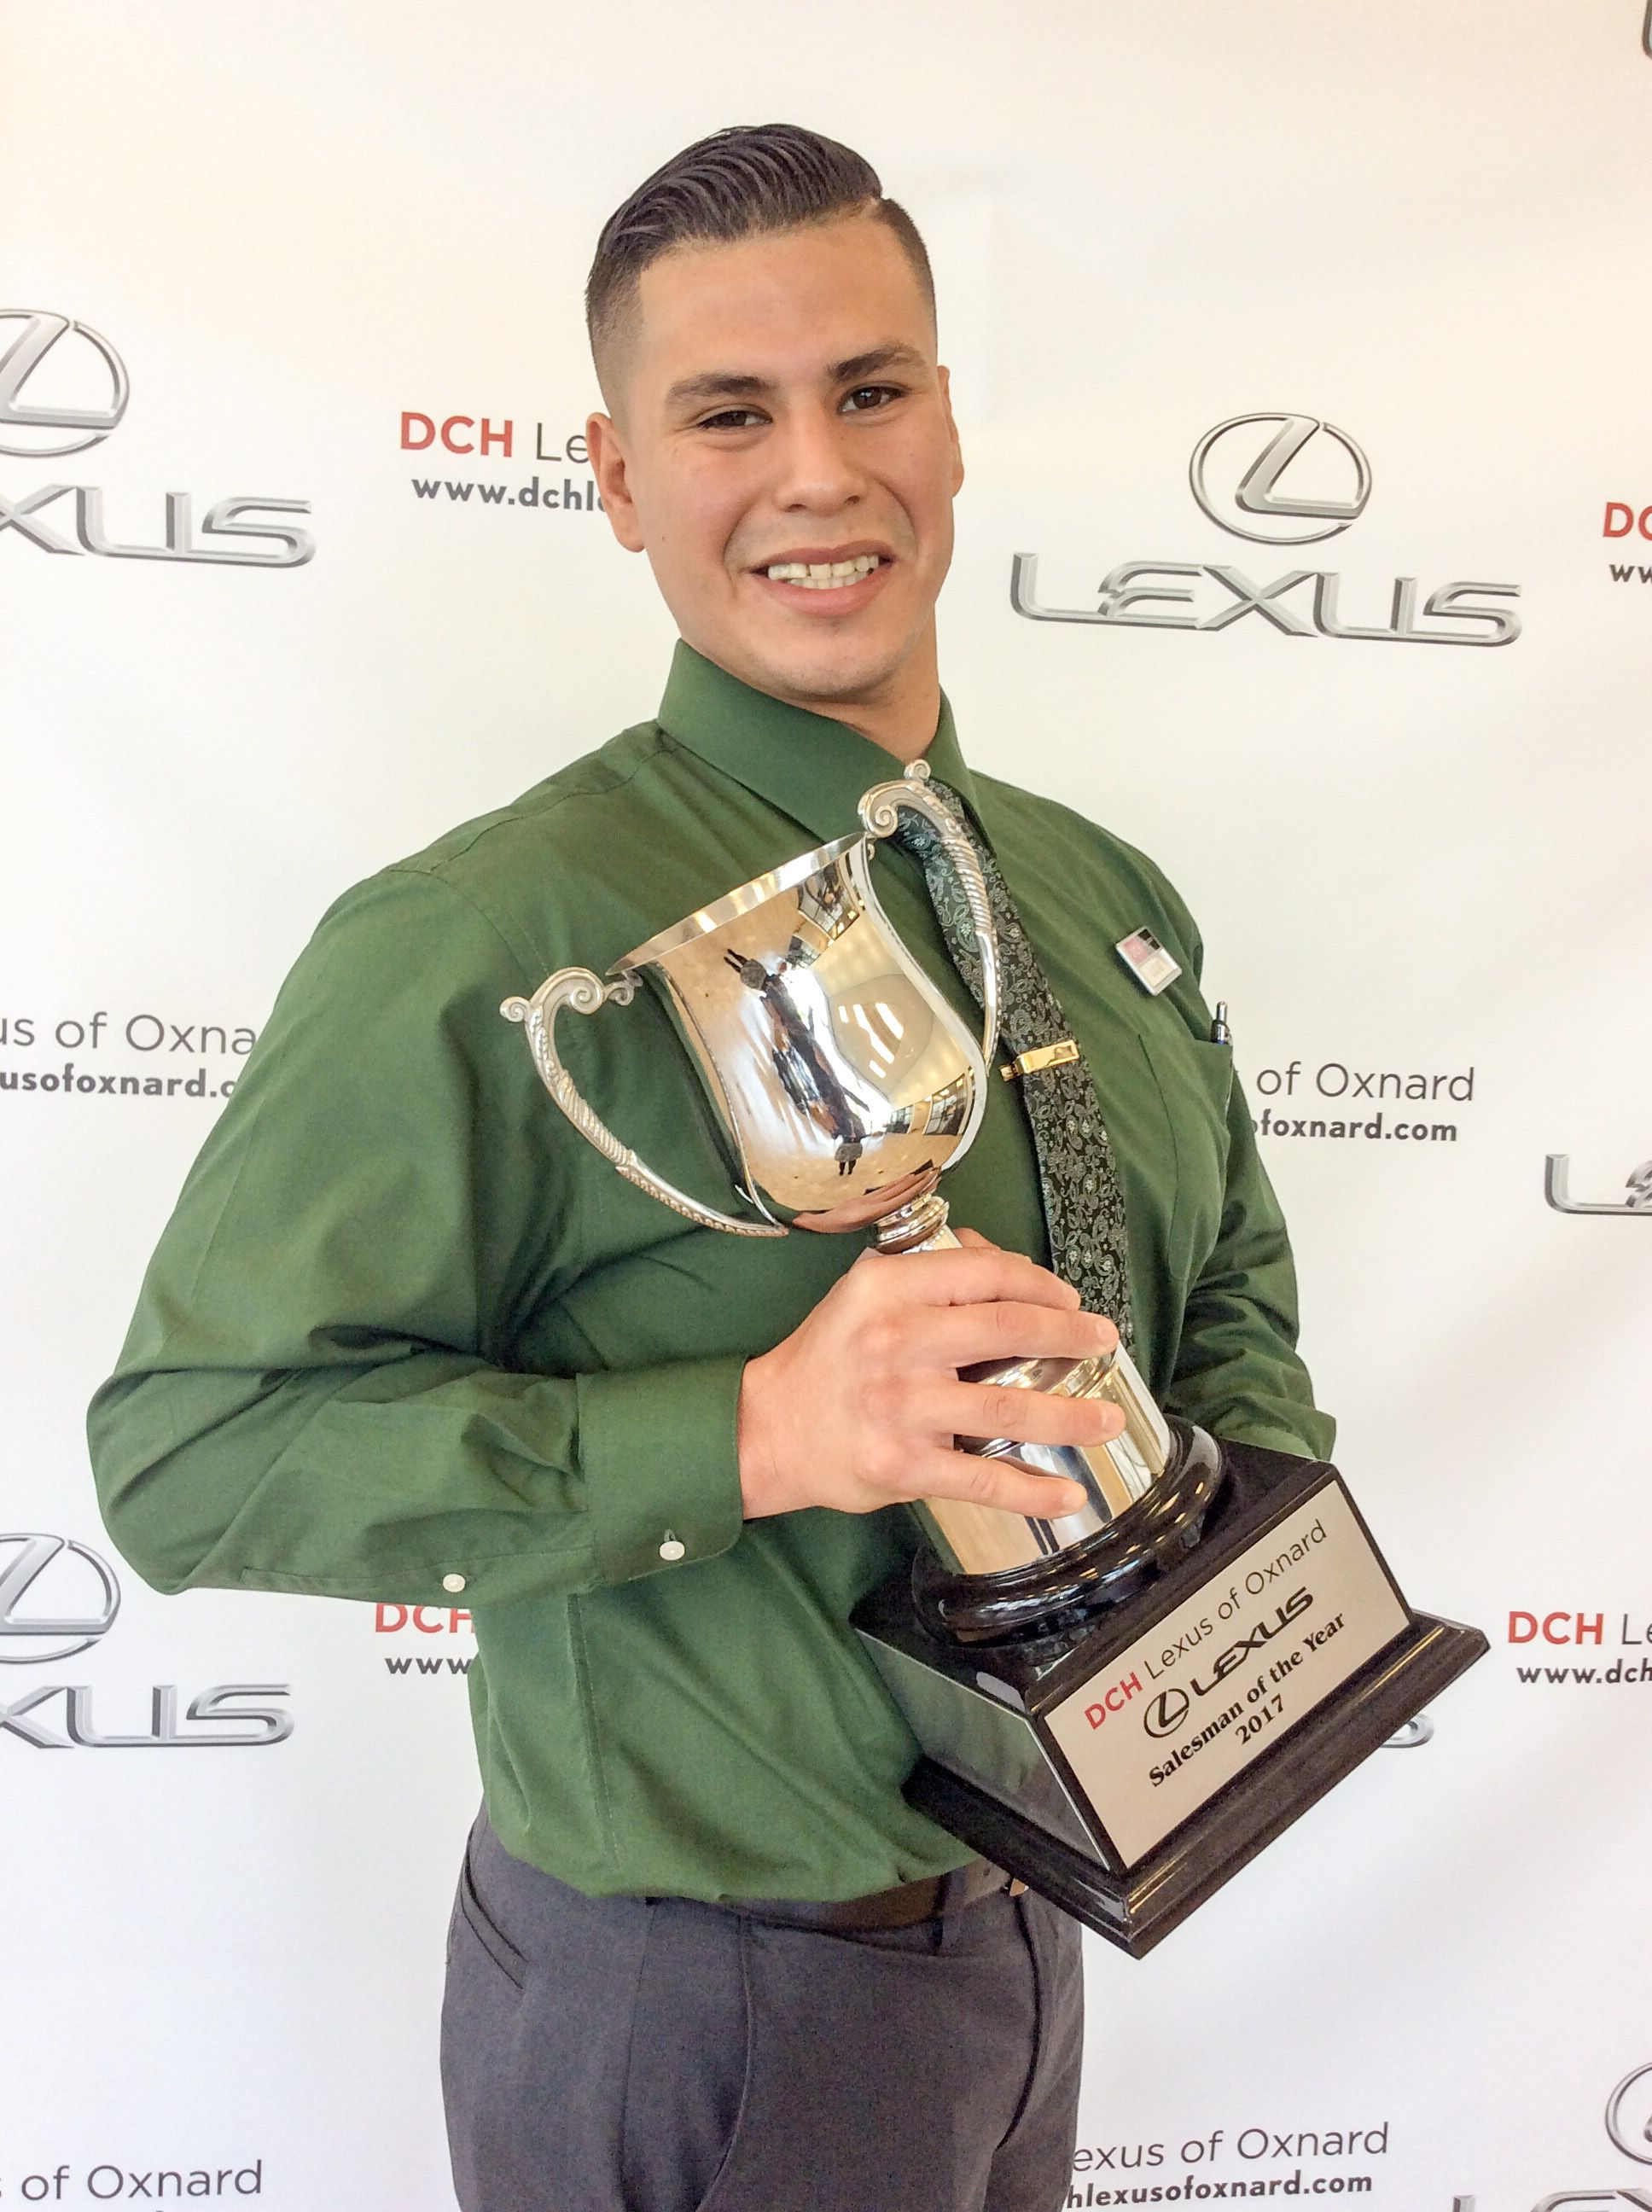 Meet The Dch Lexus Of Oxnard Team October S Salesman Of The Month Is Lucas Vega Thanks Lucas For Your Remarkable Work Ethic Oxnard Lexus Remarkable Salesman of the month award